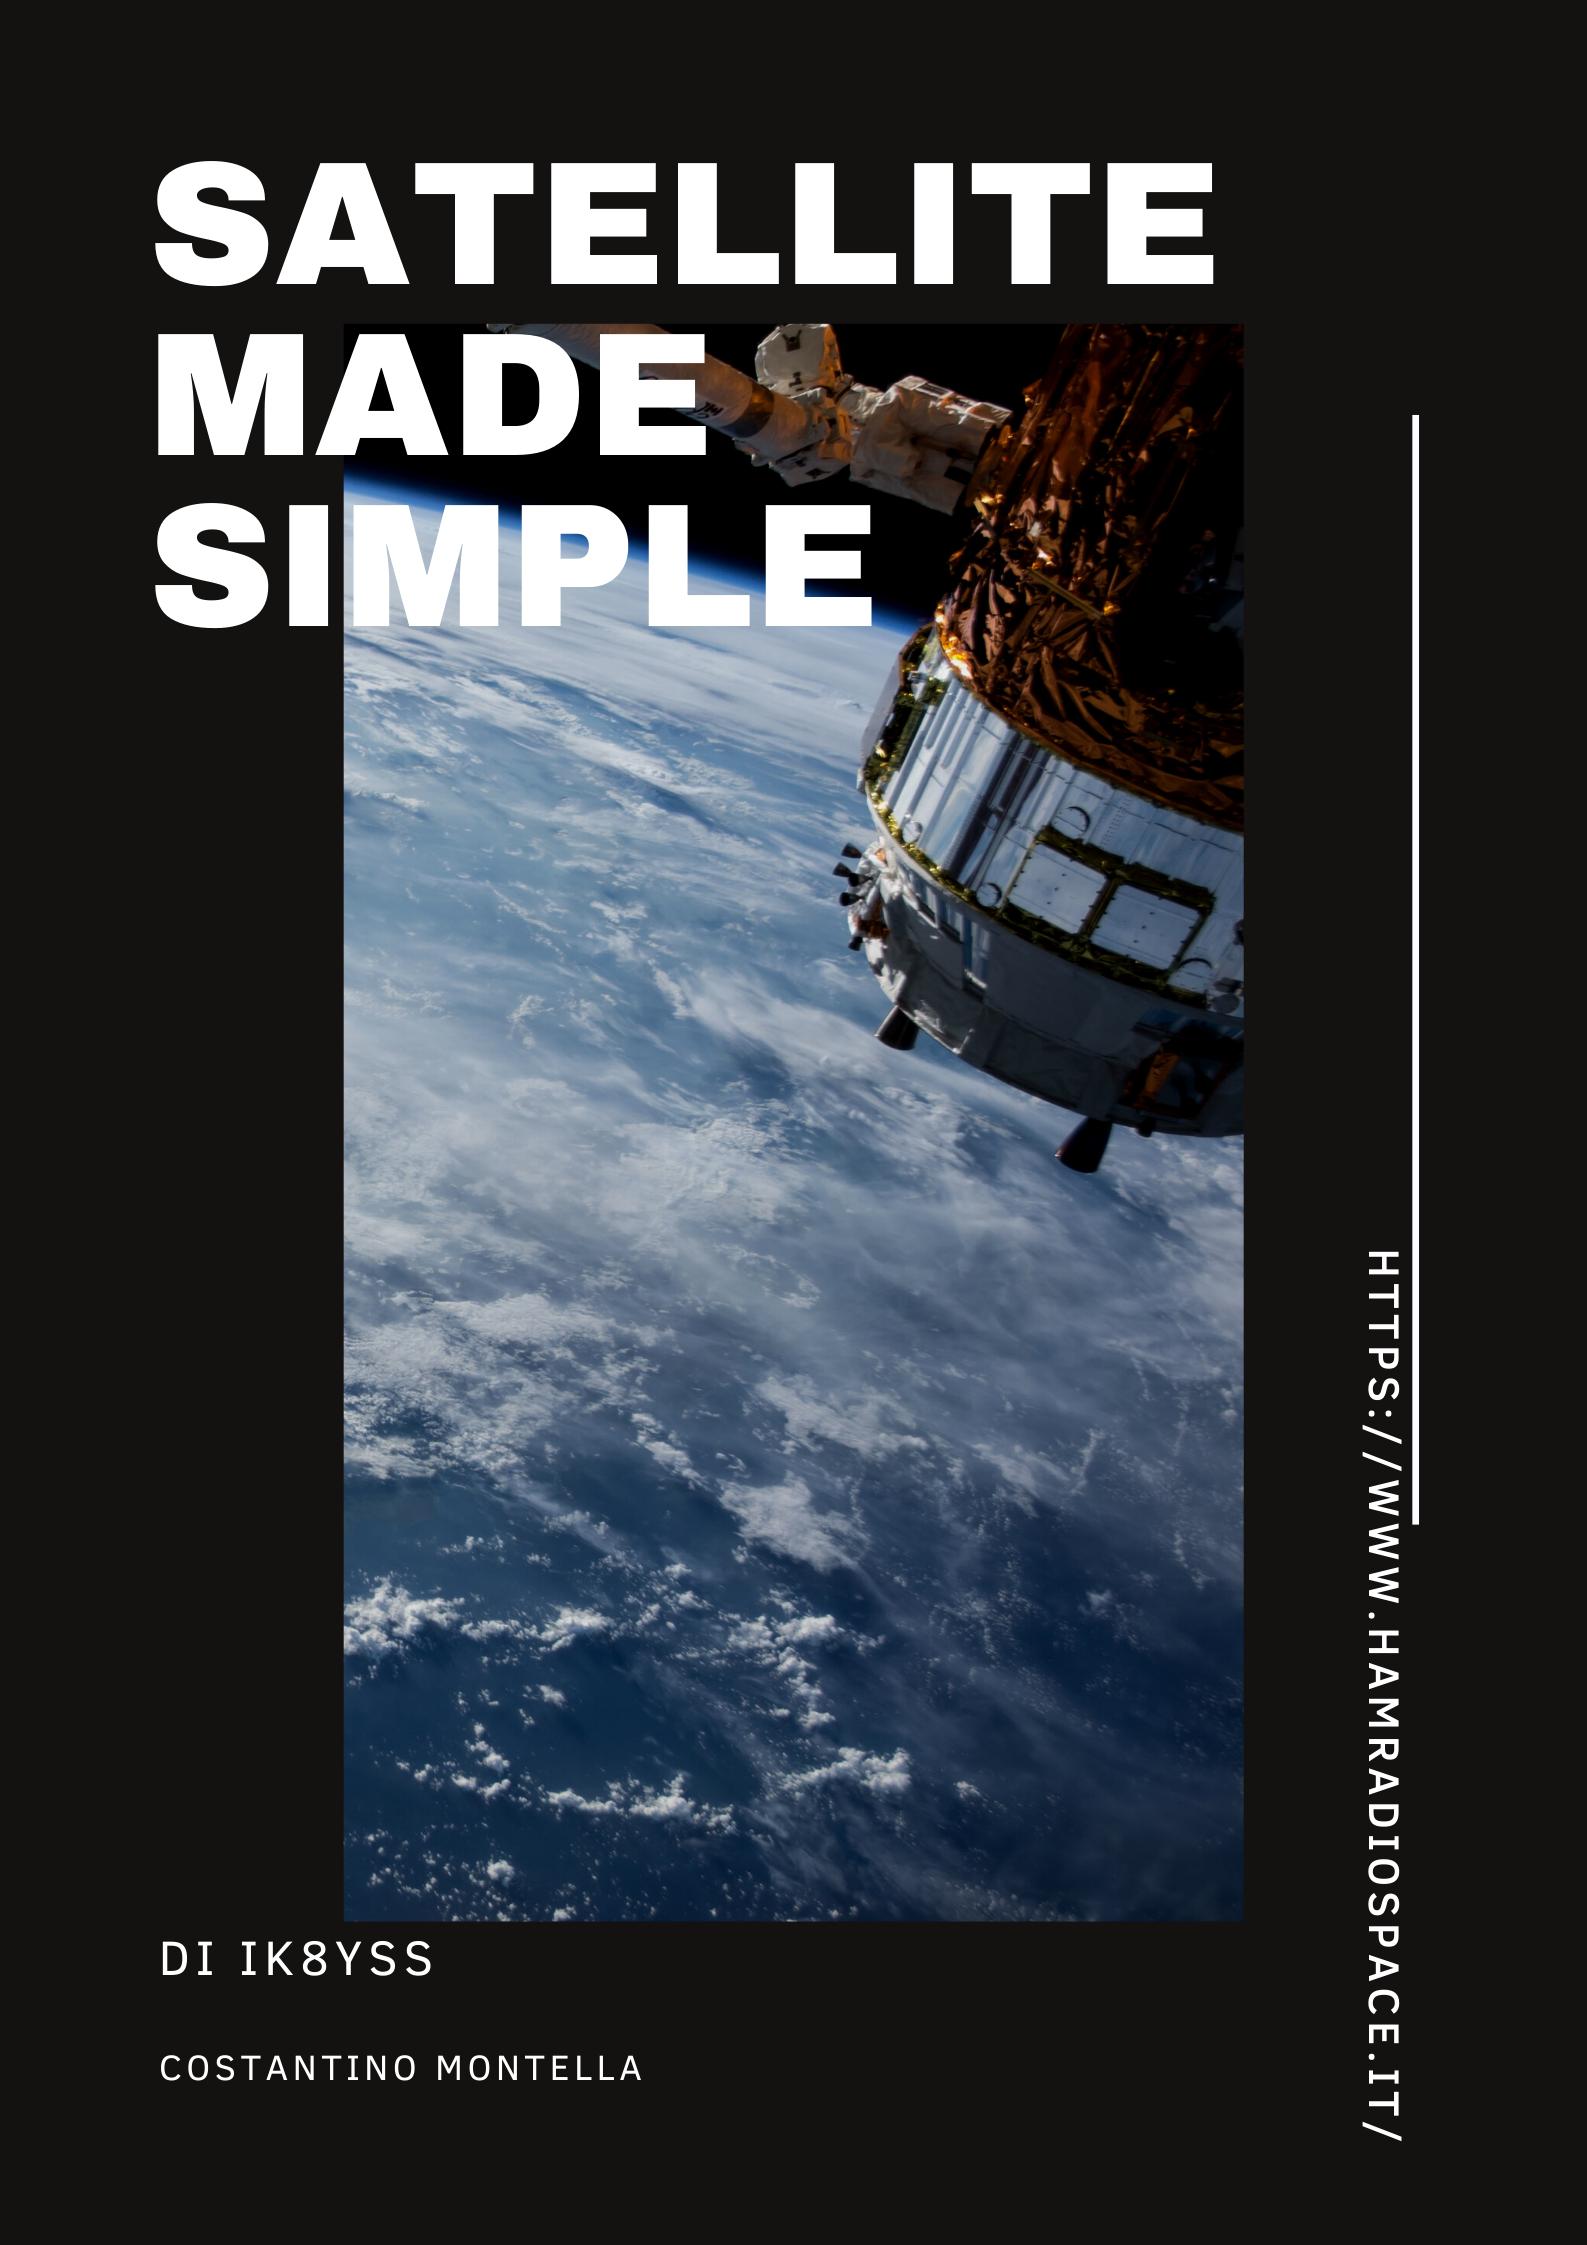 Satellite Made Simple